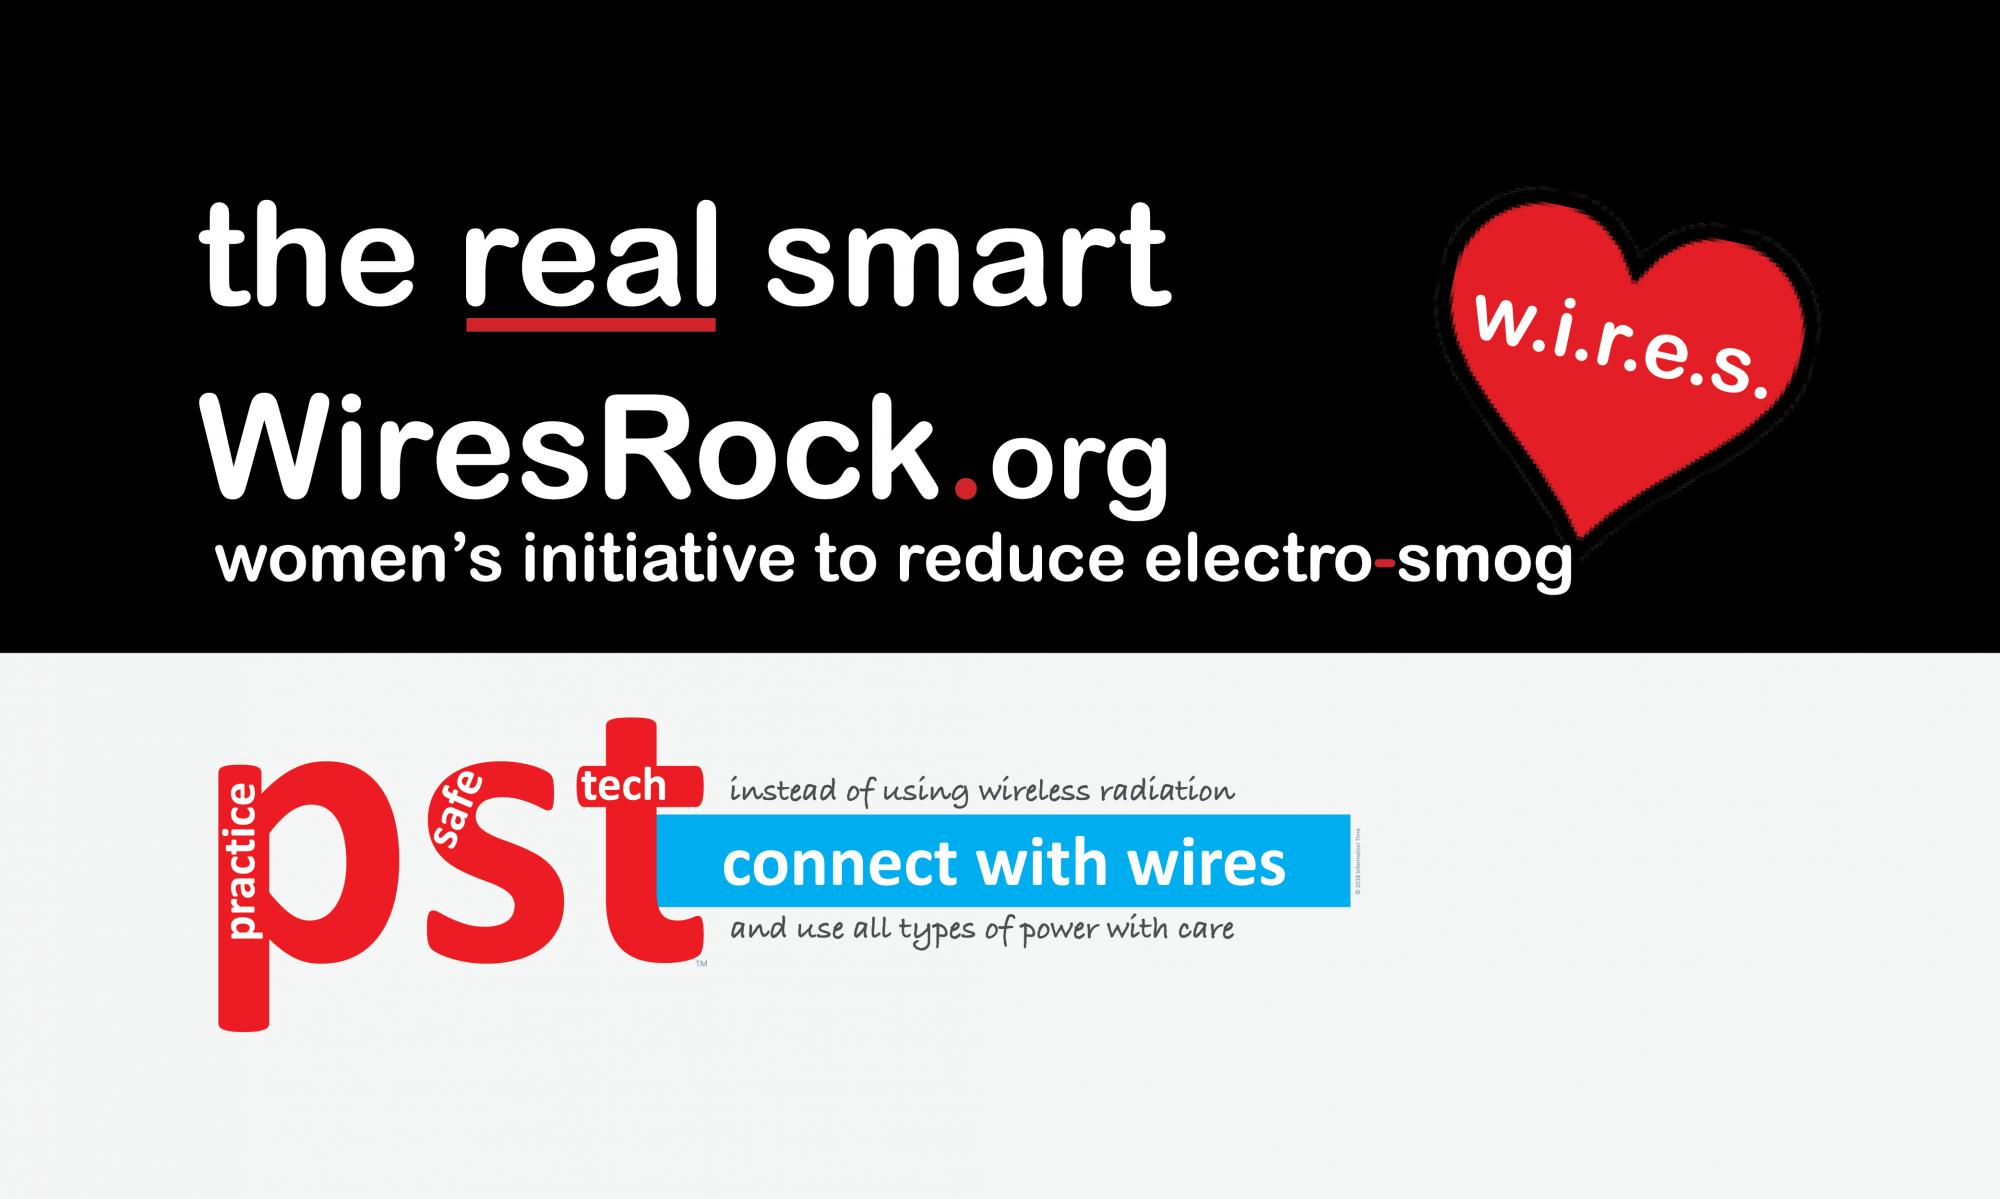 WiresRock